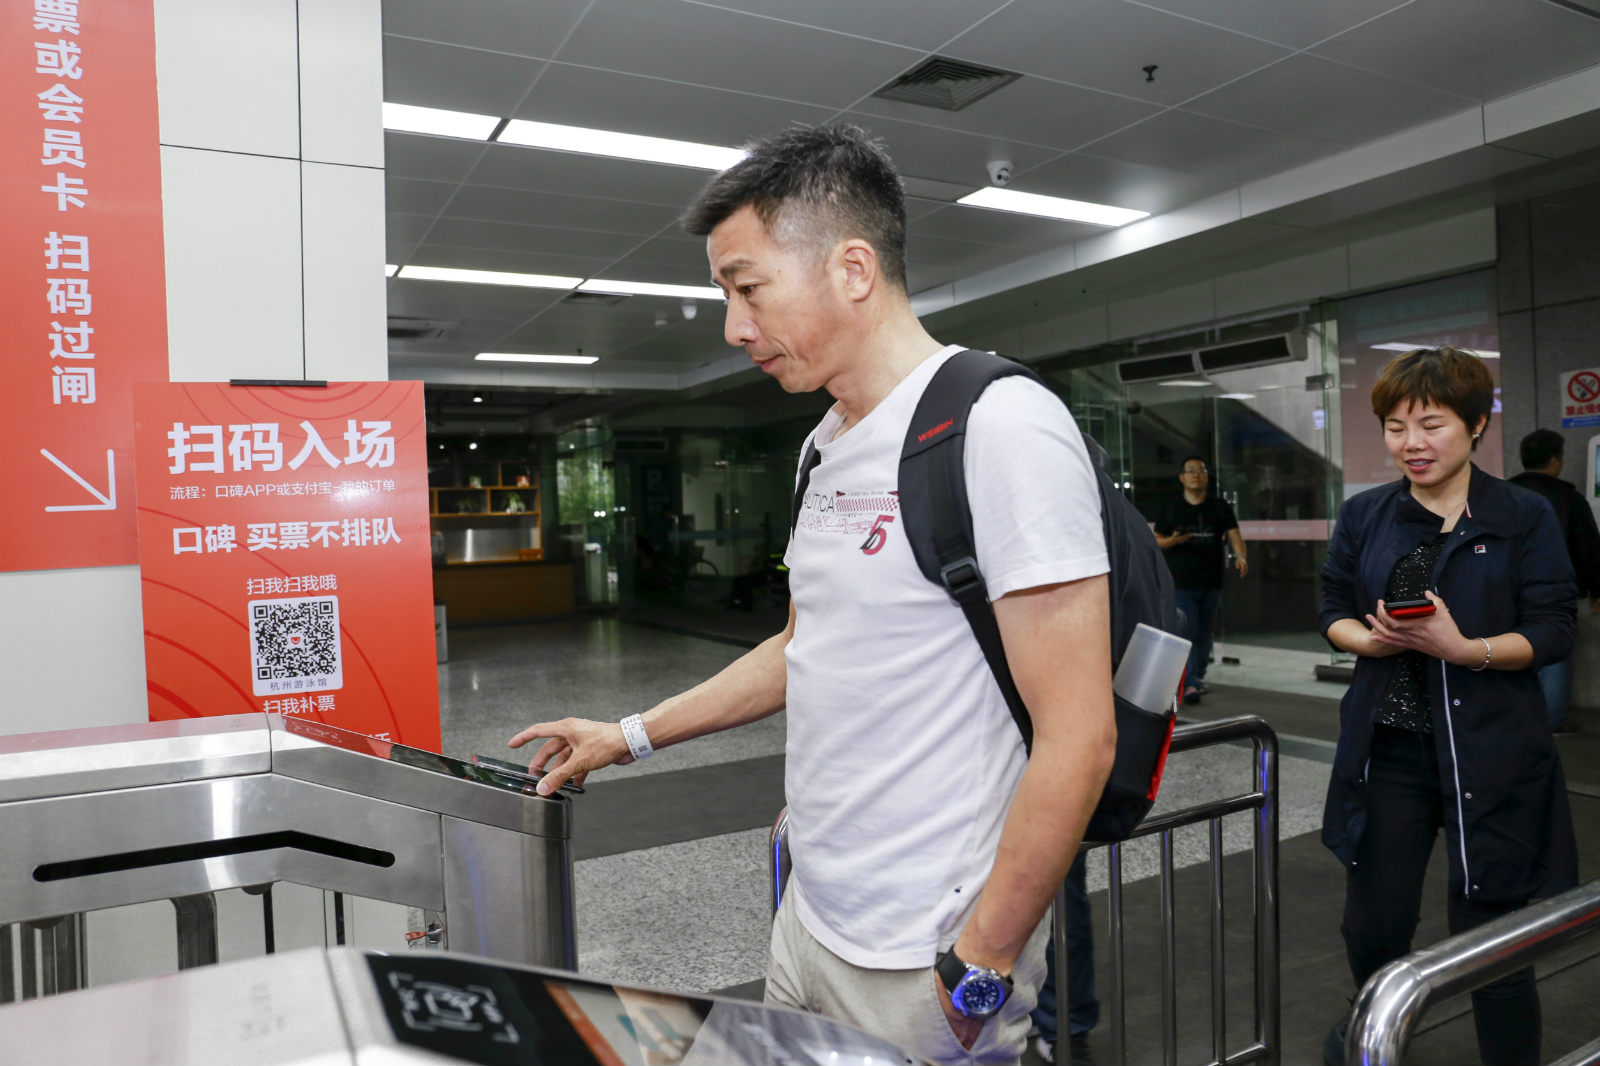 dnf决战人工智能答案刷0元手机就能游泳全国首家智慧游泳馆亮相杭州